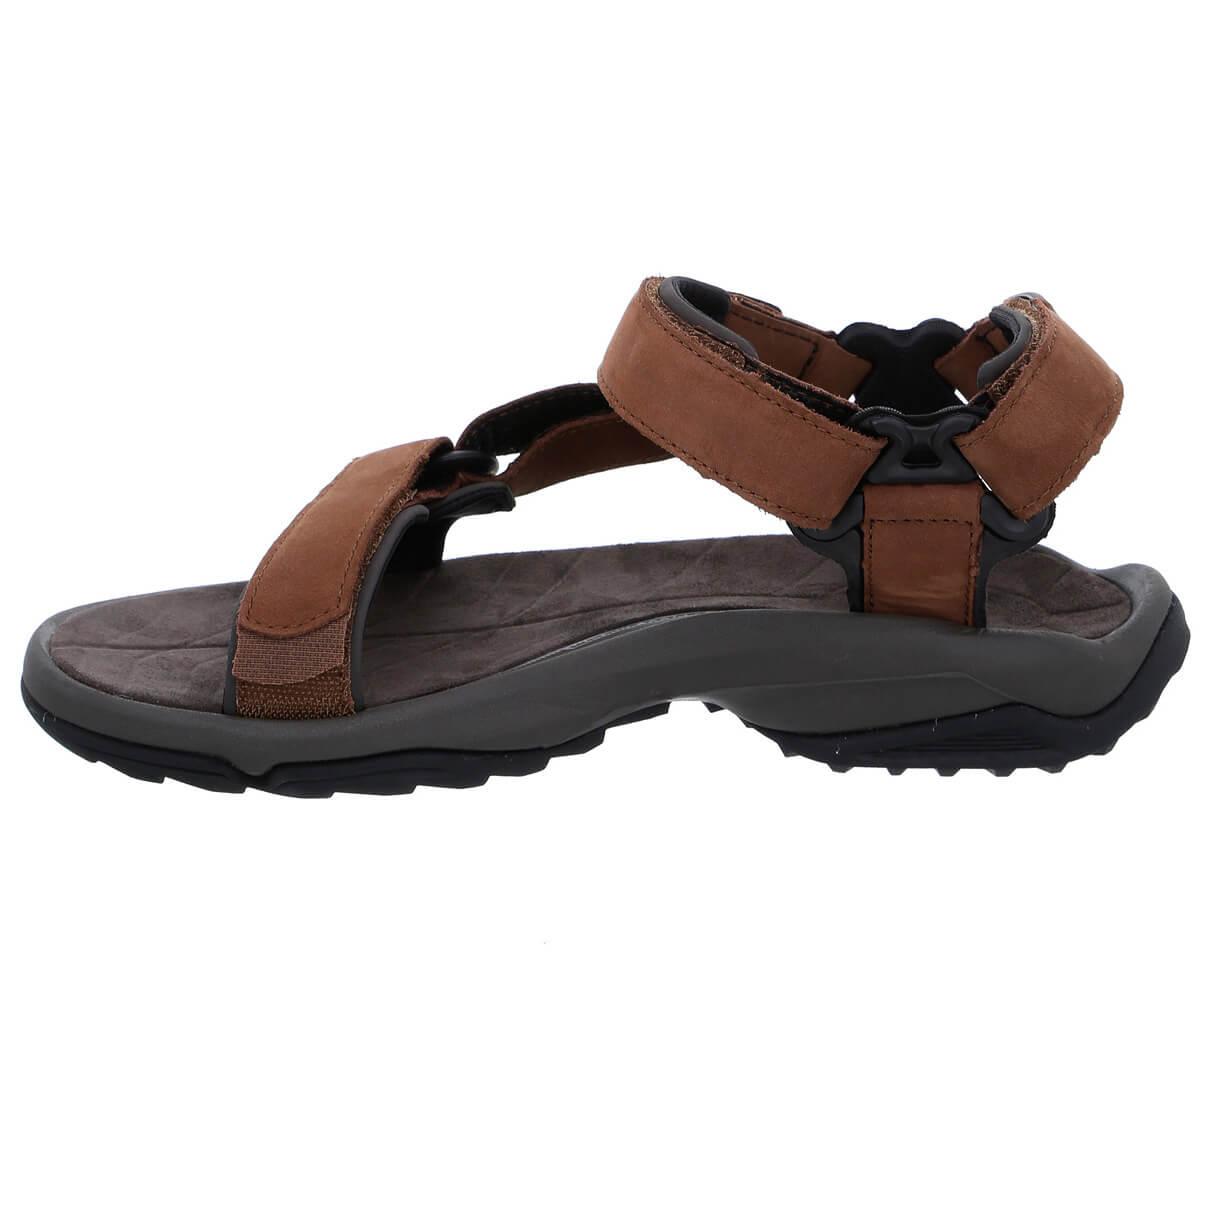 on sale 3d71c 9669d Teva - Terra Fi Lite Leather - Sandalen - Brown   15 (US)